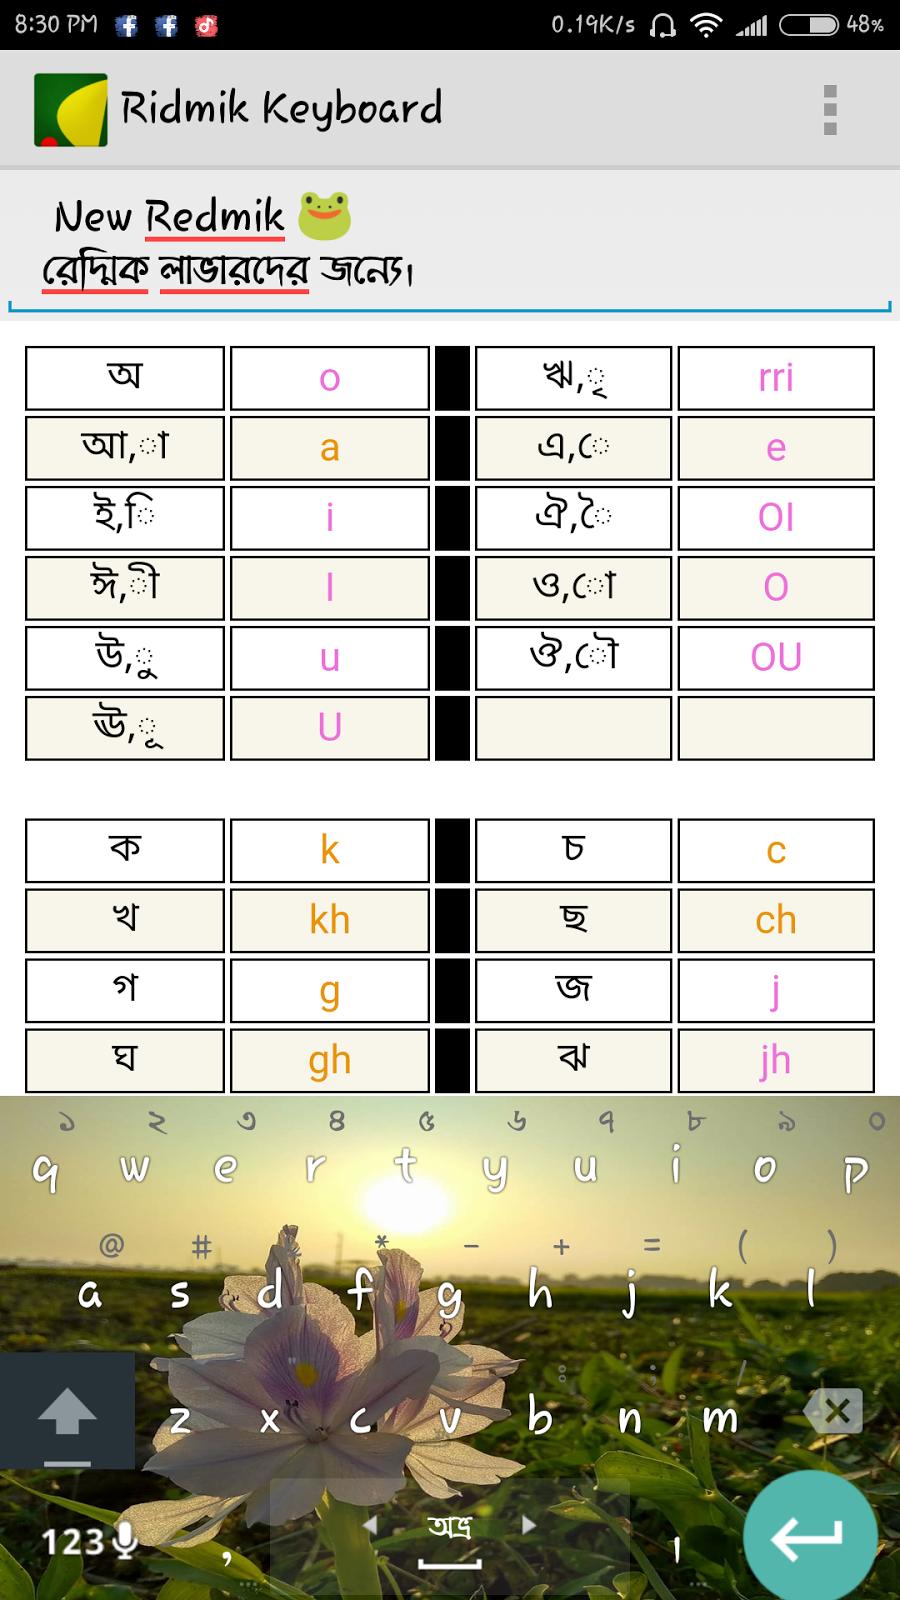 ridmik keyboard old version with emoji